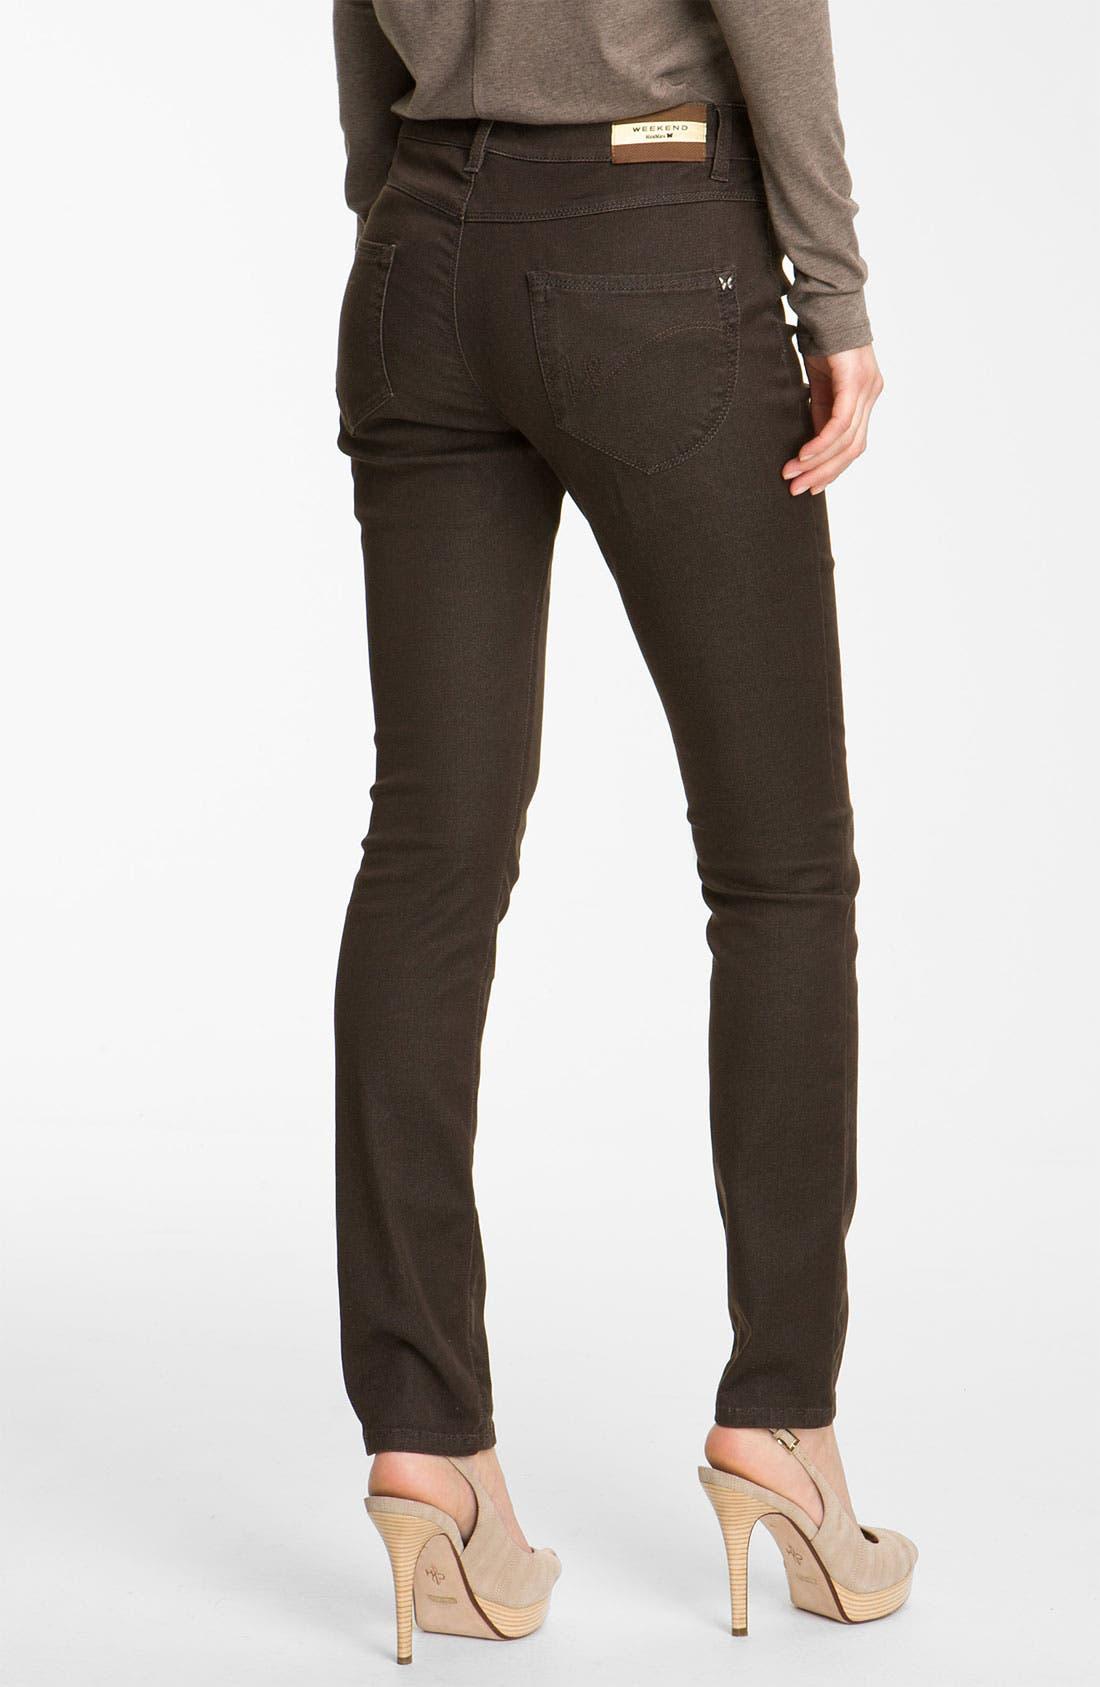 Alternate Image 1 Selected - Weekend Max Mara 'Jolly' Jeans